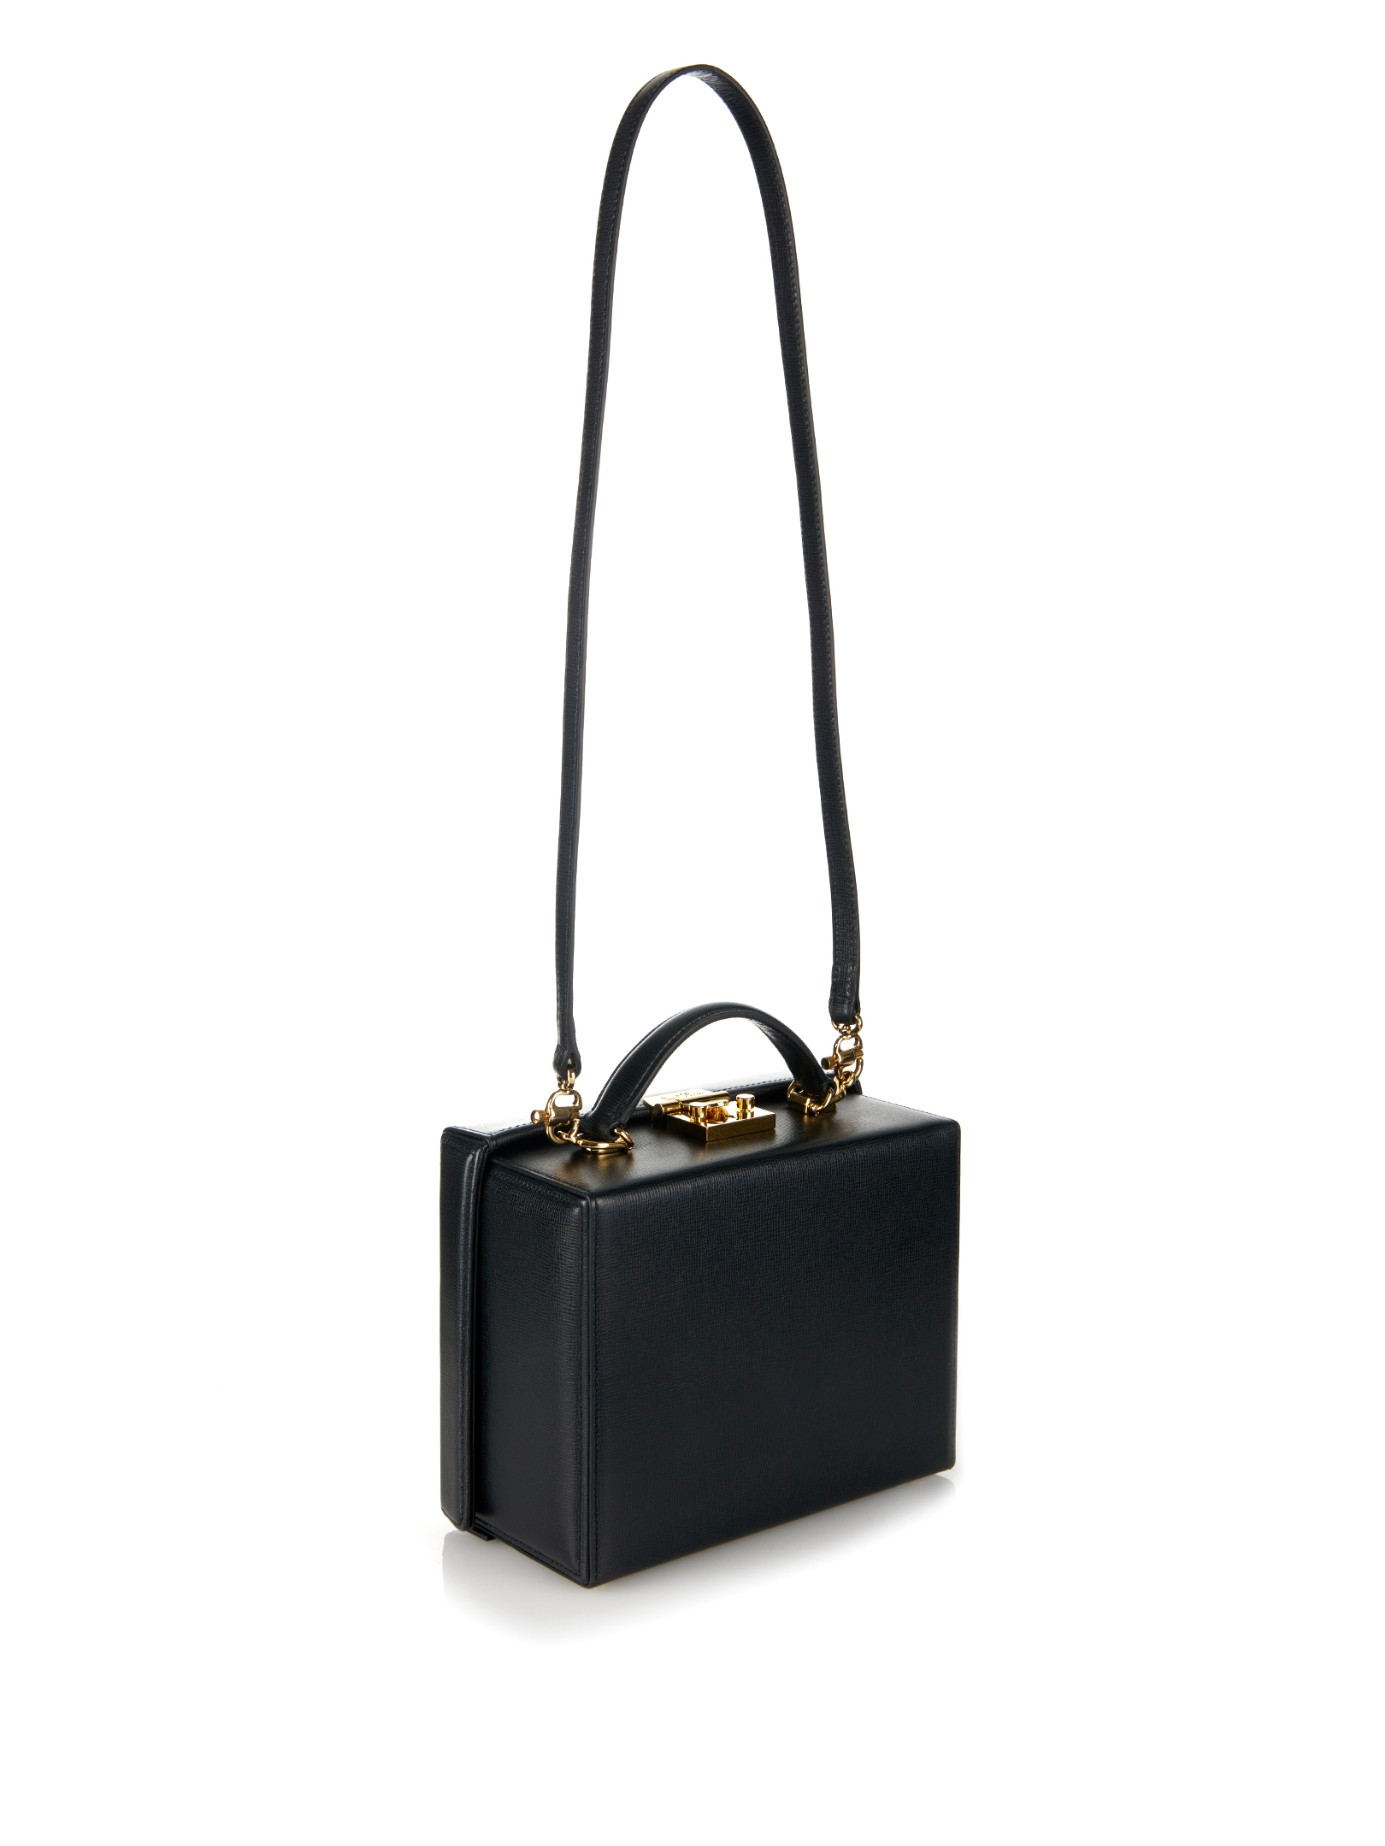 c351cb3786eaf Mark Cross Grace Large Leather Box Bag in Black - Lyst